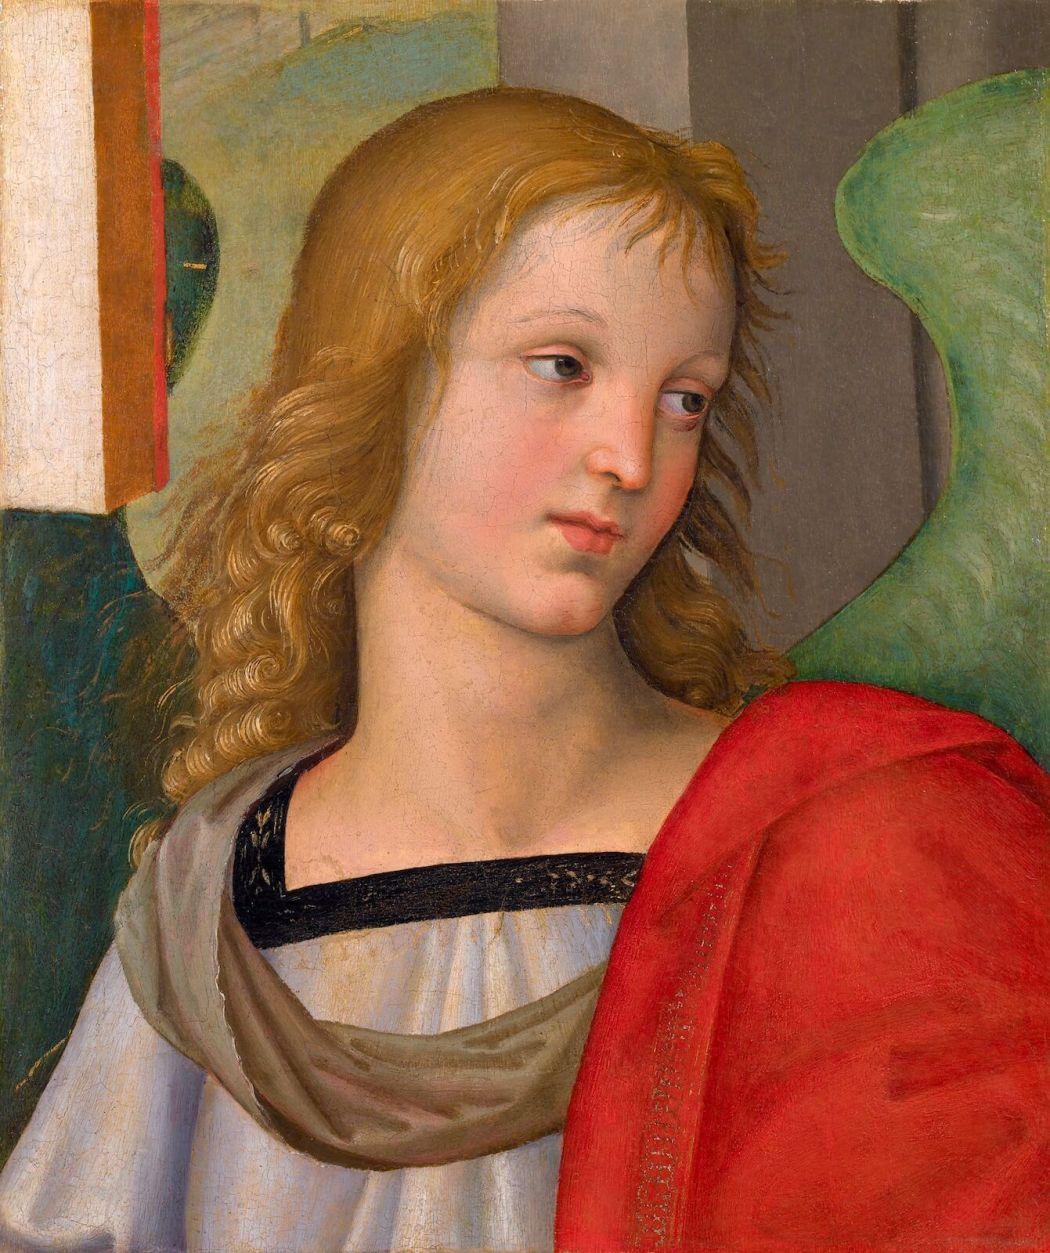 Rafaël, Engel, 1501, Pinacoteca Tosio Martingo Brecia